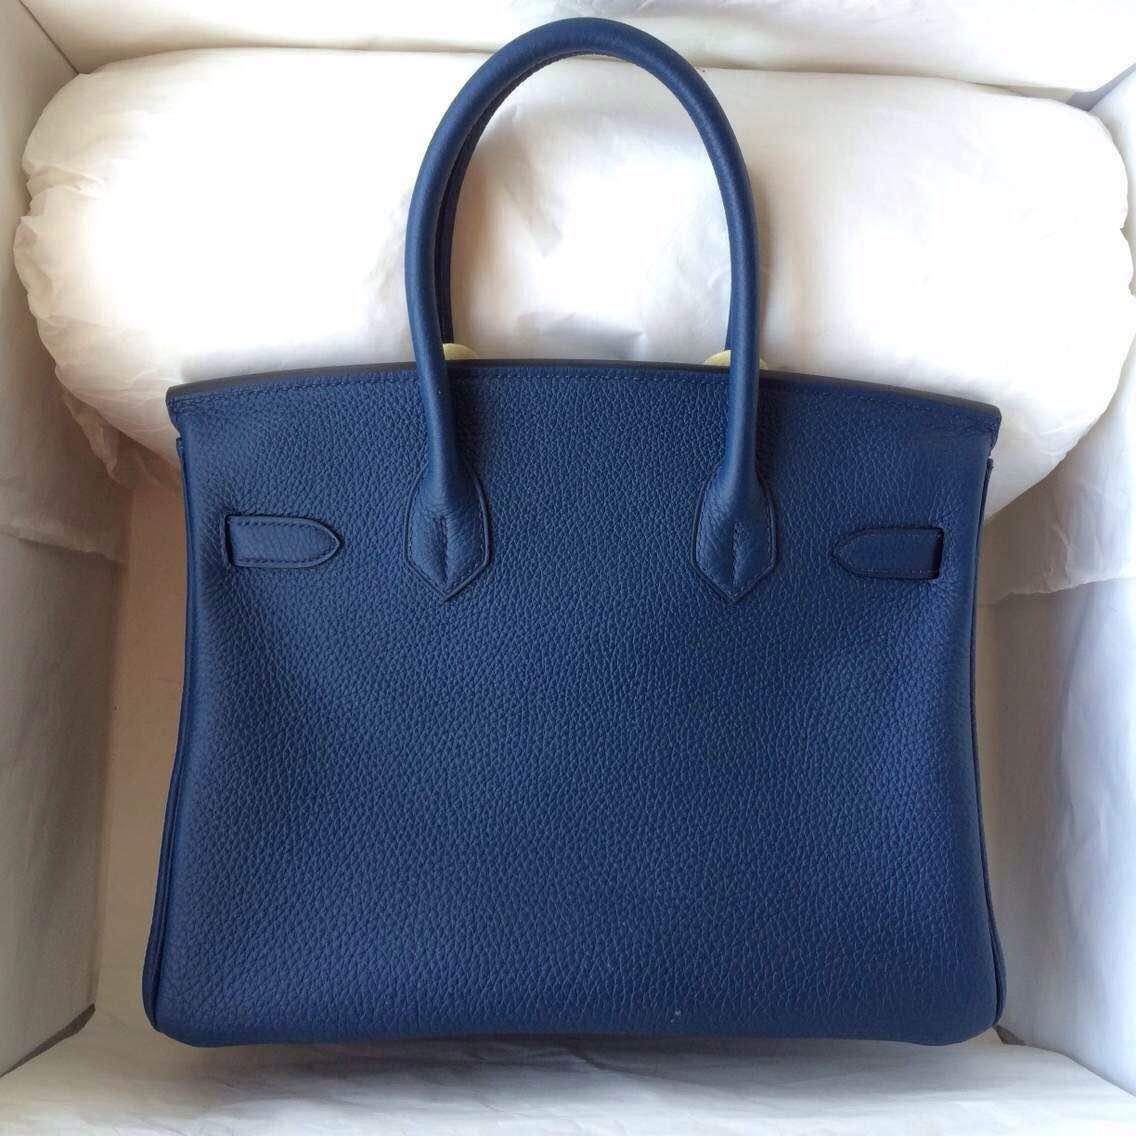 30cm Hermes Birkin Bag 7K Blue Saphir Togo Calfskin Leather Women's Handbag